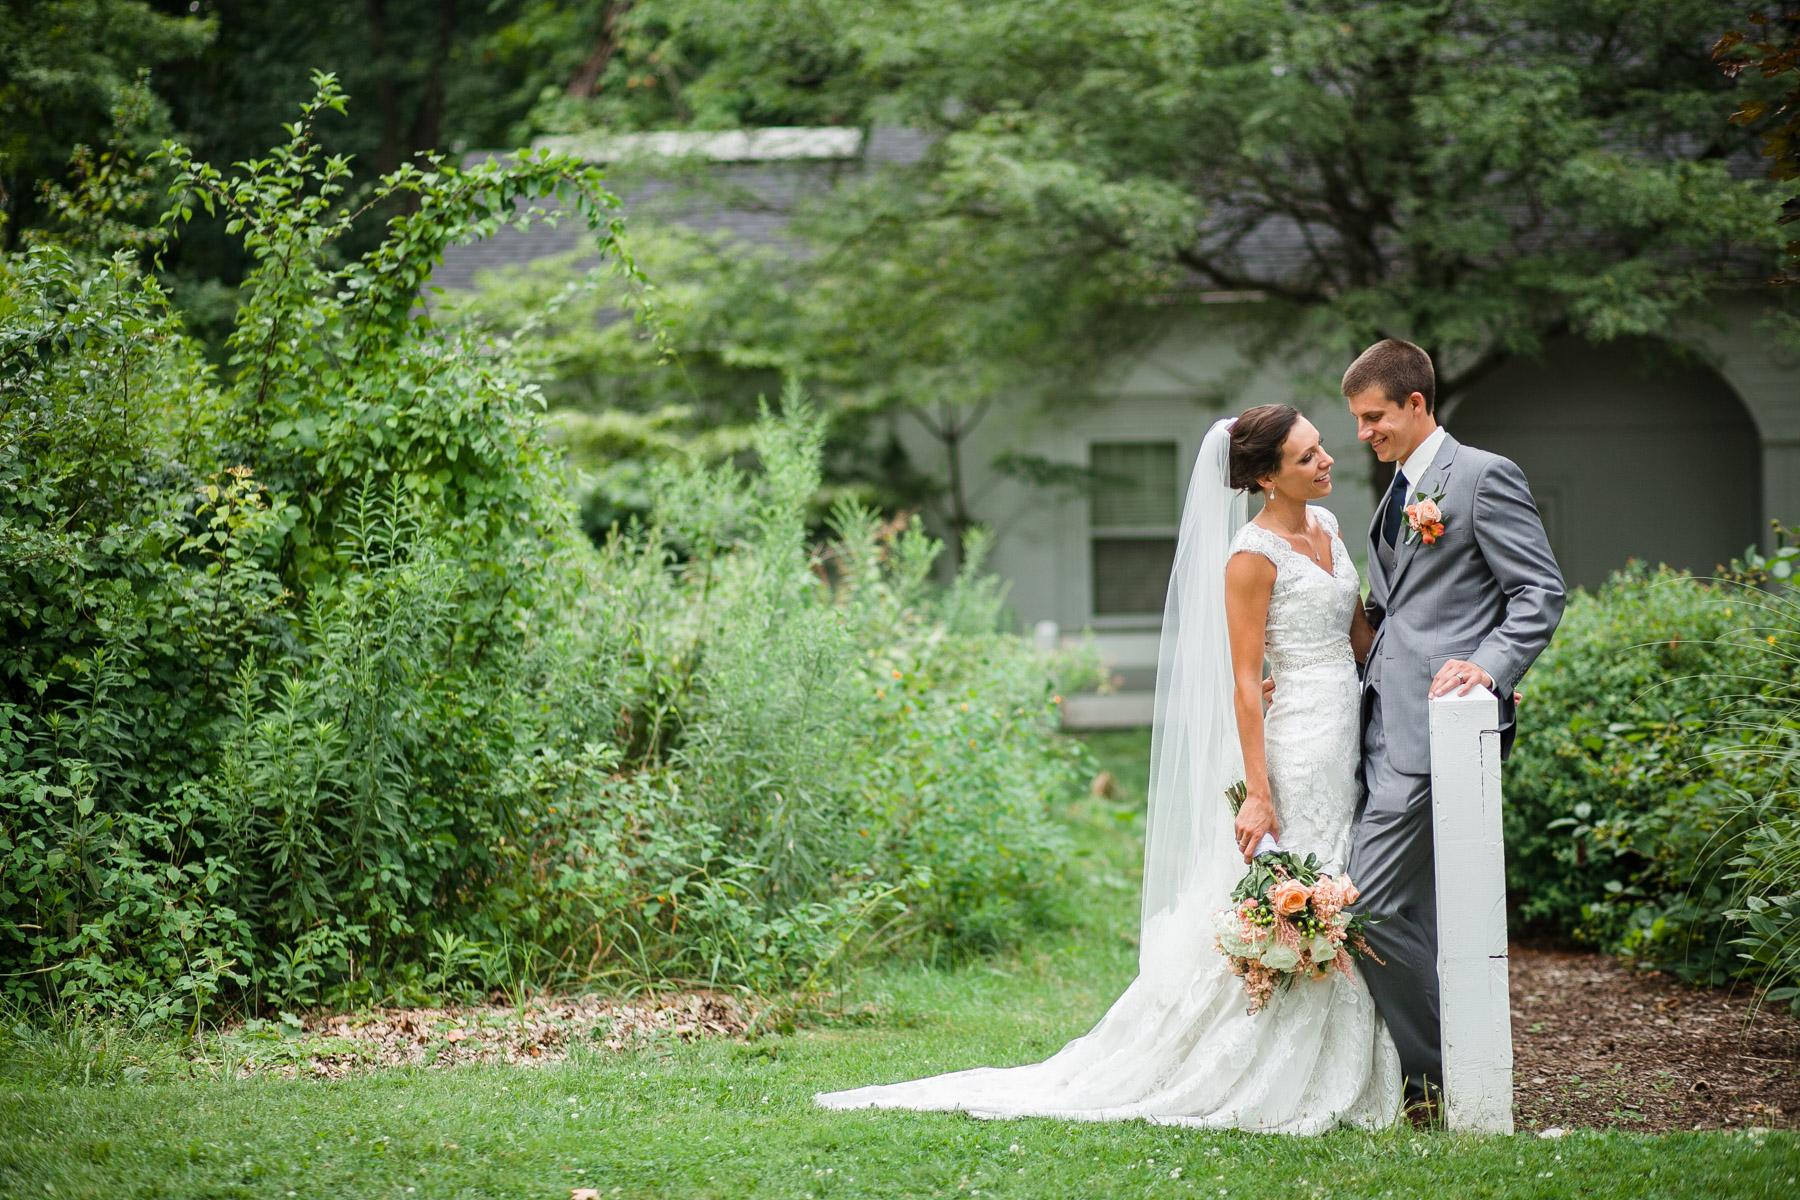 wildwood-park-wedding-photos-61.jpg